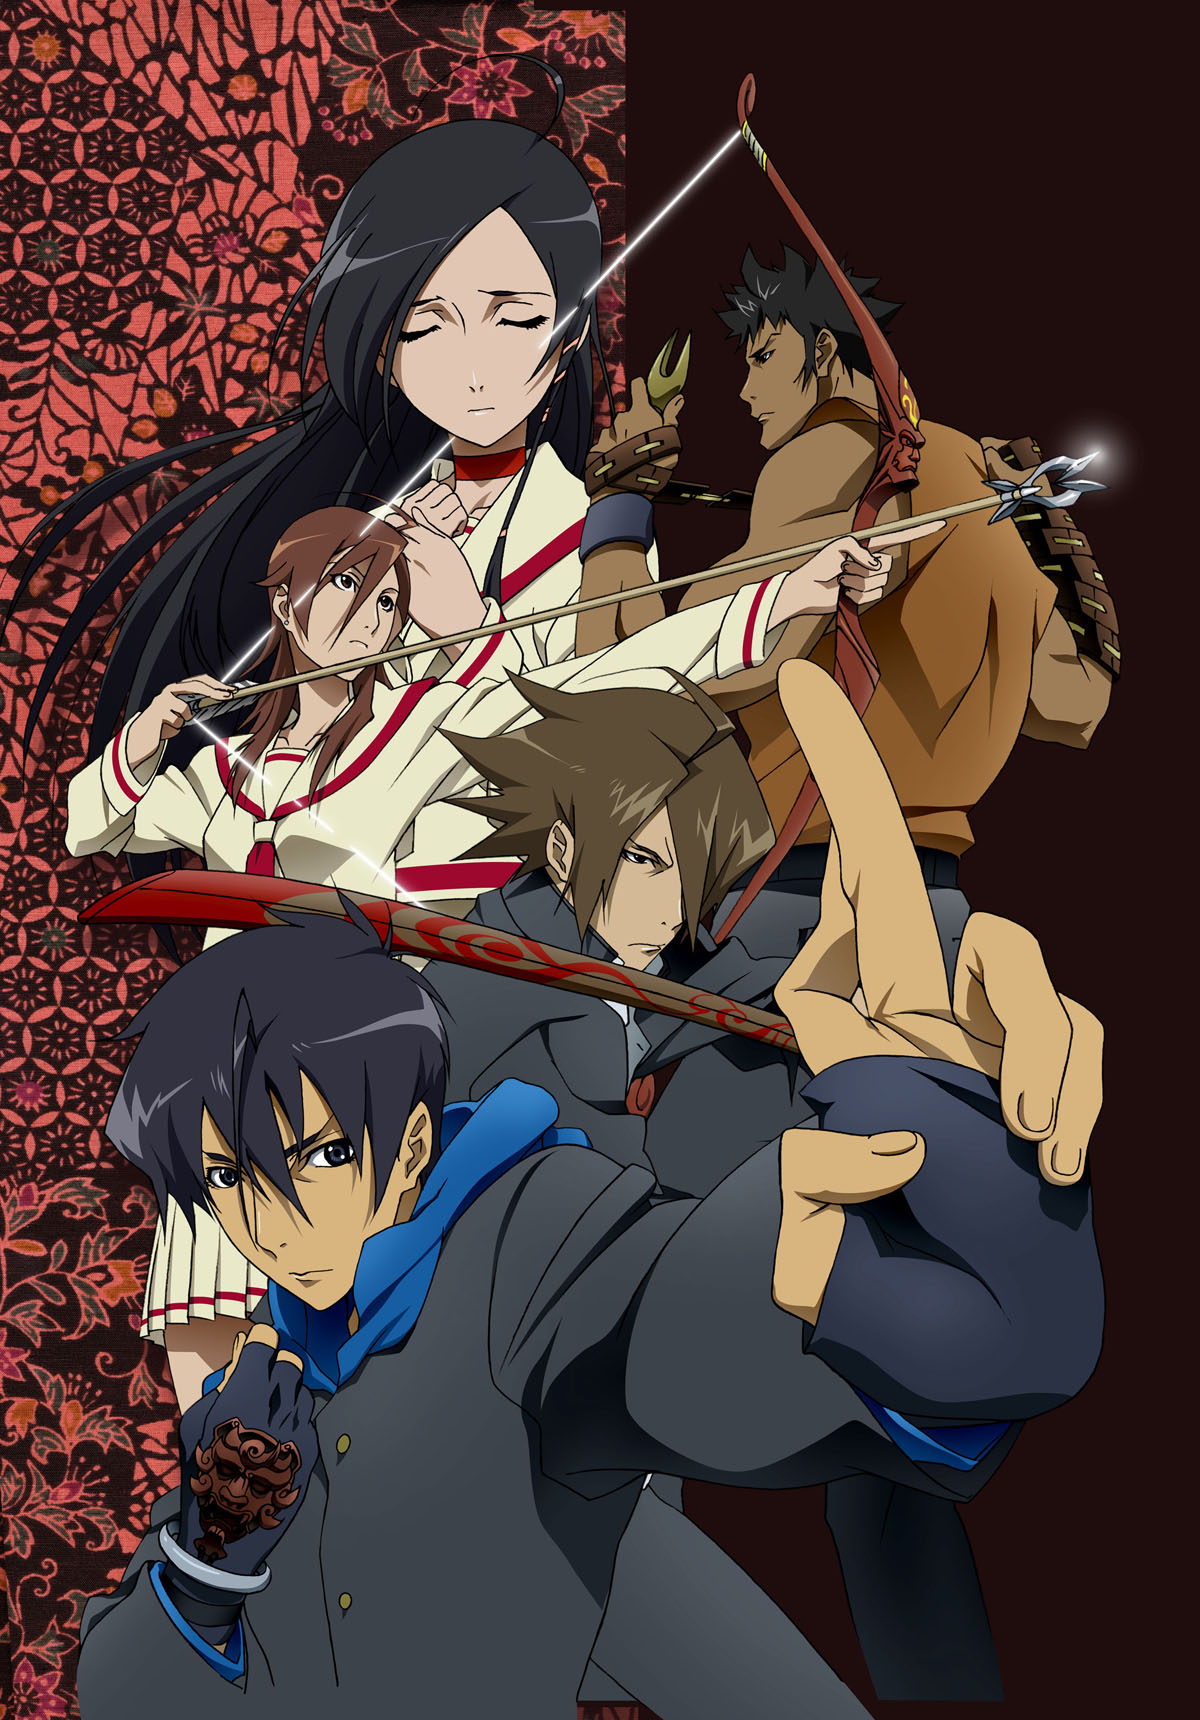 Amazon.com: Tokyo Majin: Season 1, Part Two: Movies & TV